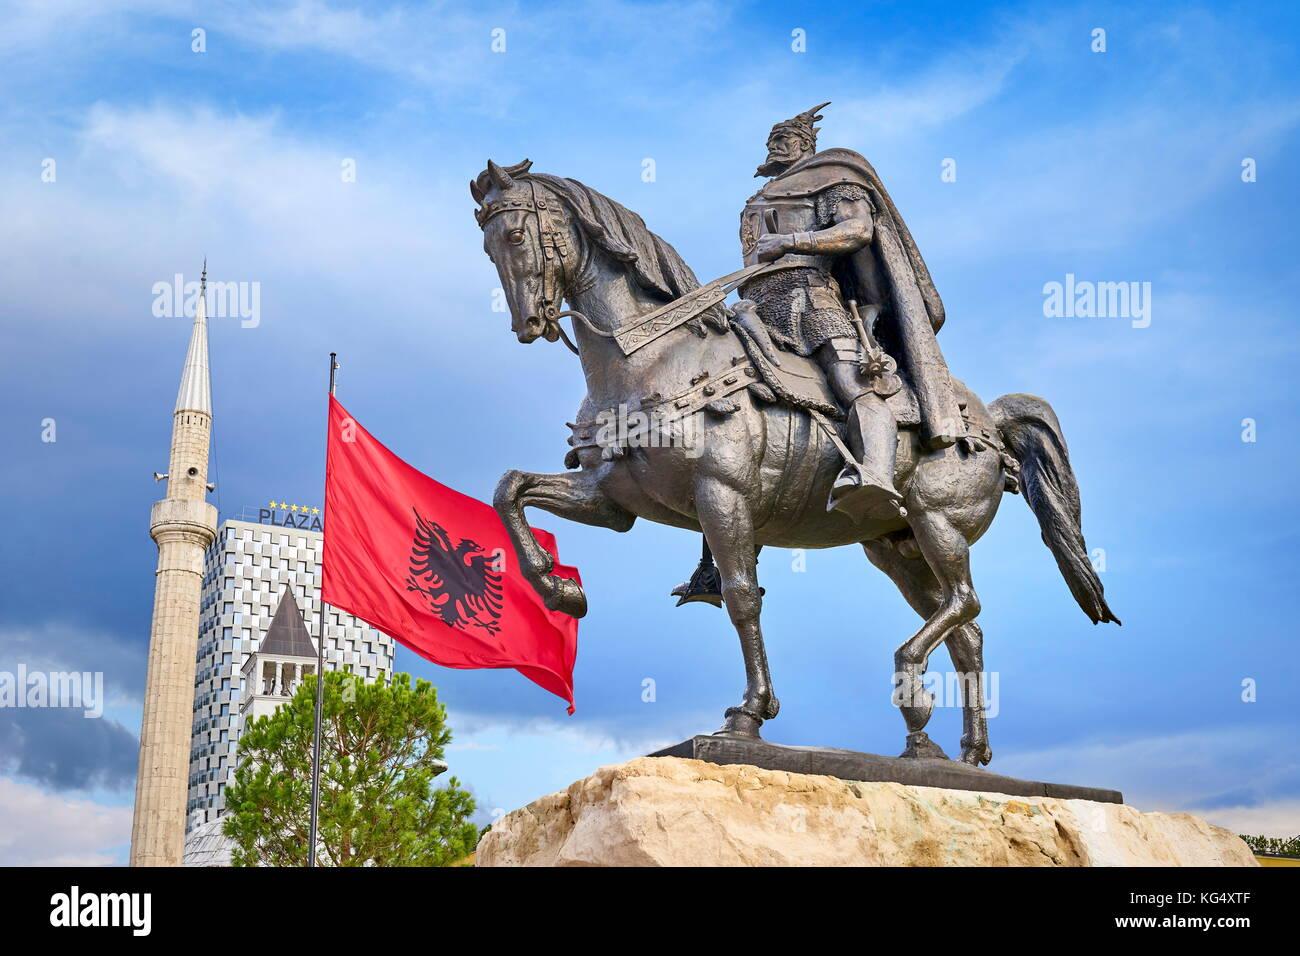 Albania, Tirana - statue of Skanderbeg, Skanderbeg Square - Stock Image